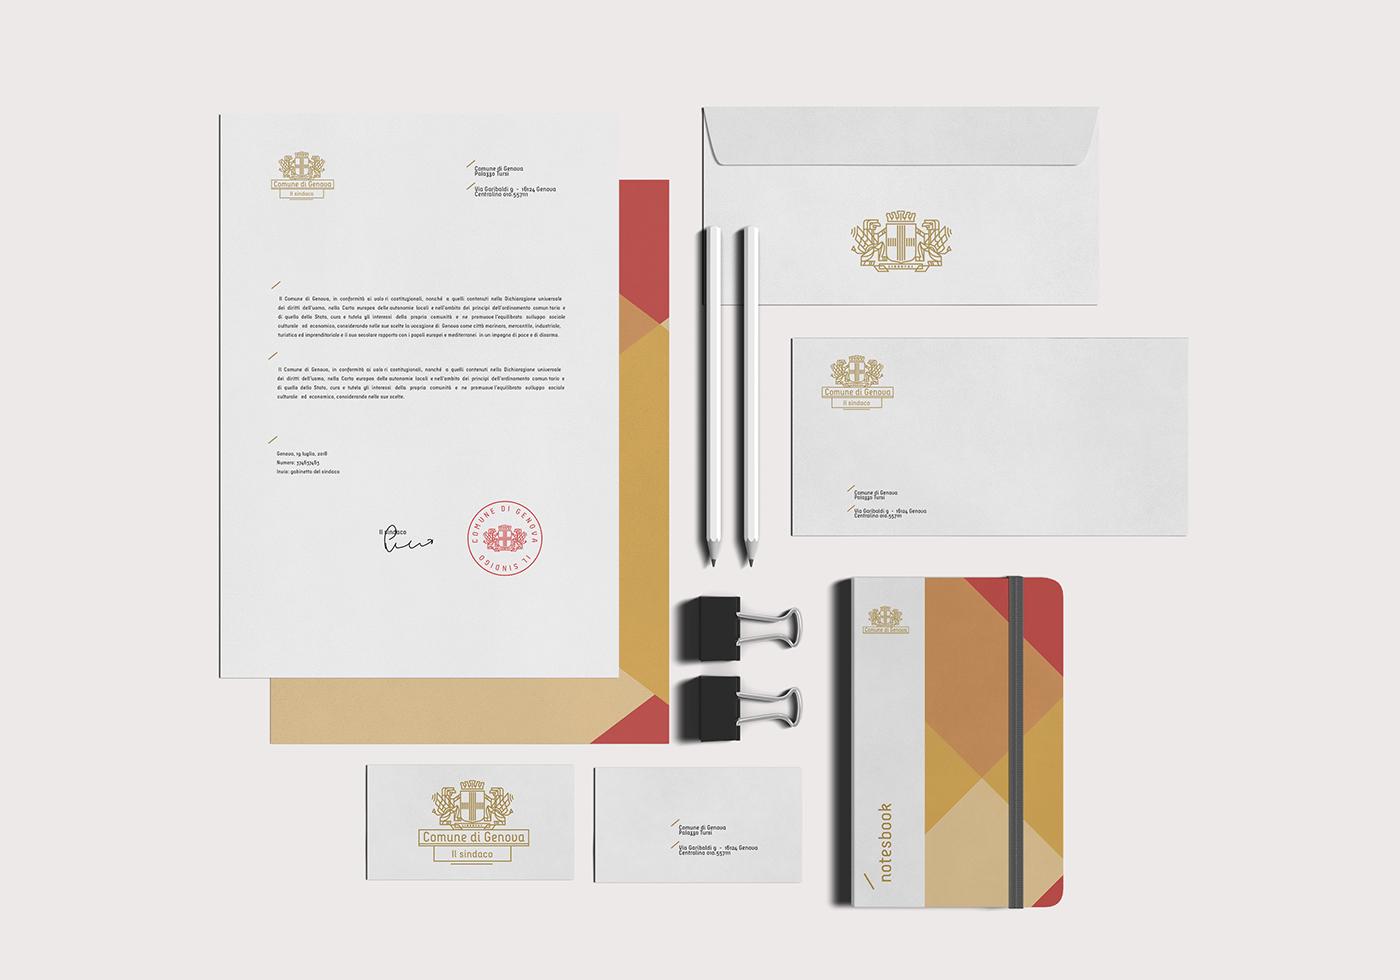 Concept Branding for City of Genova